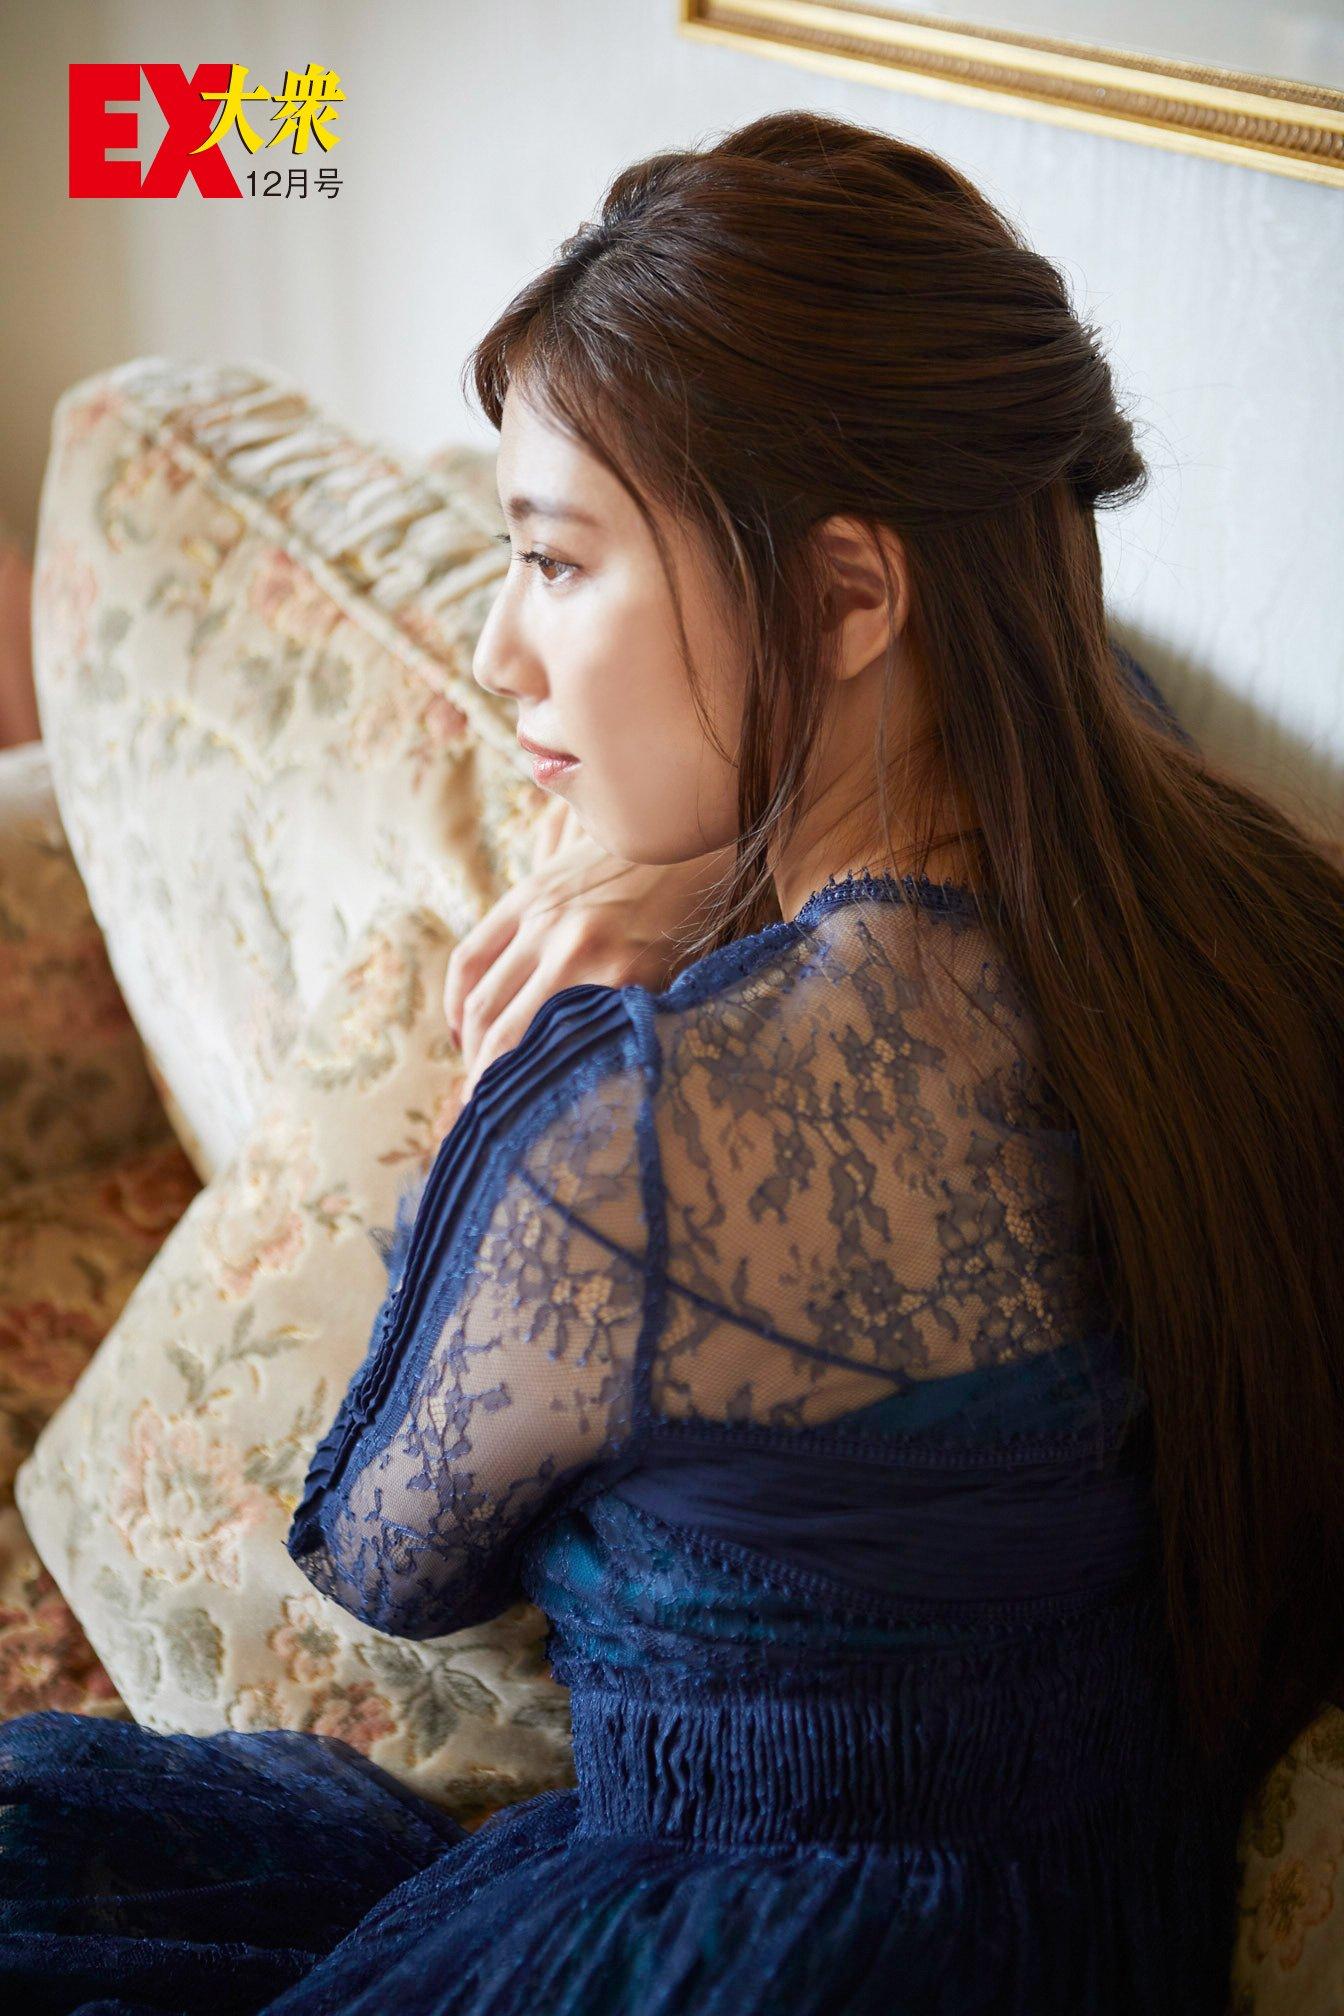 SKE48荒井優希の本誌未掲載カット6枚を大公開!【EX大衆12月号】の画像005